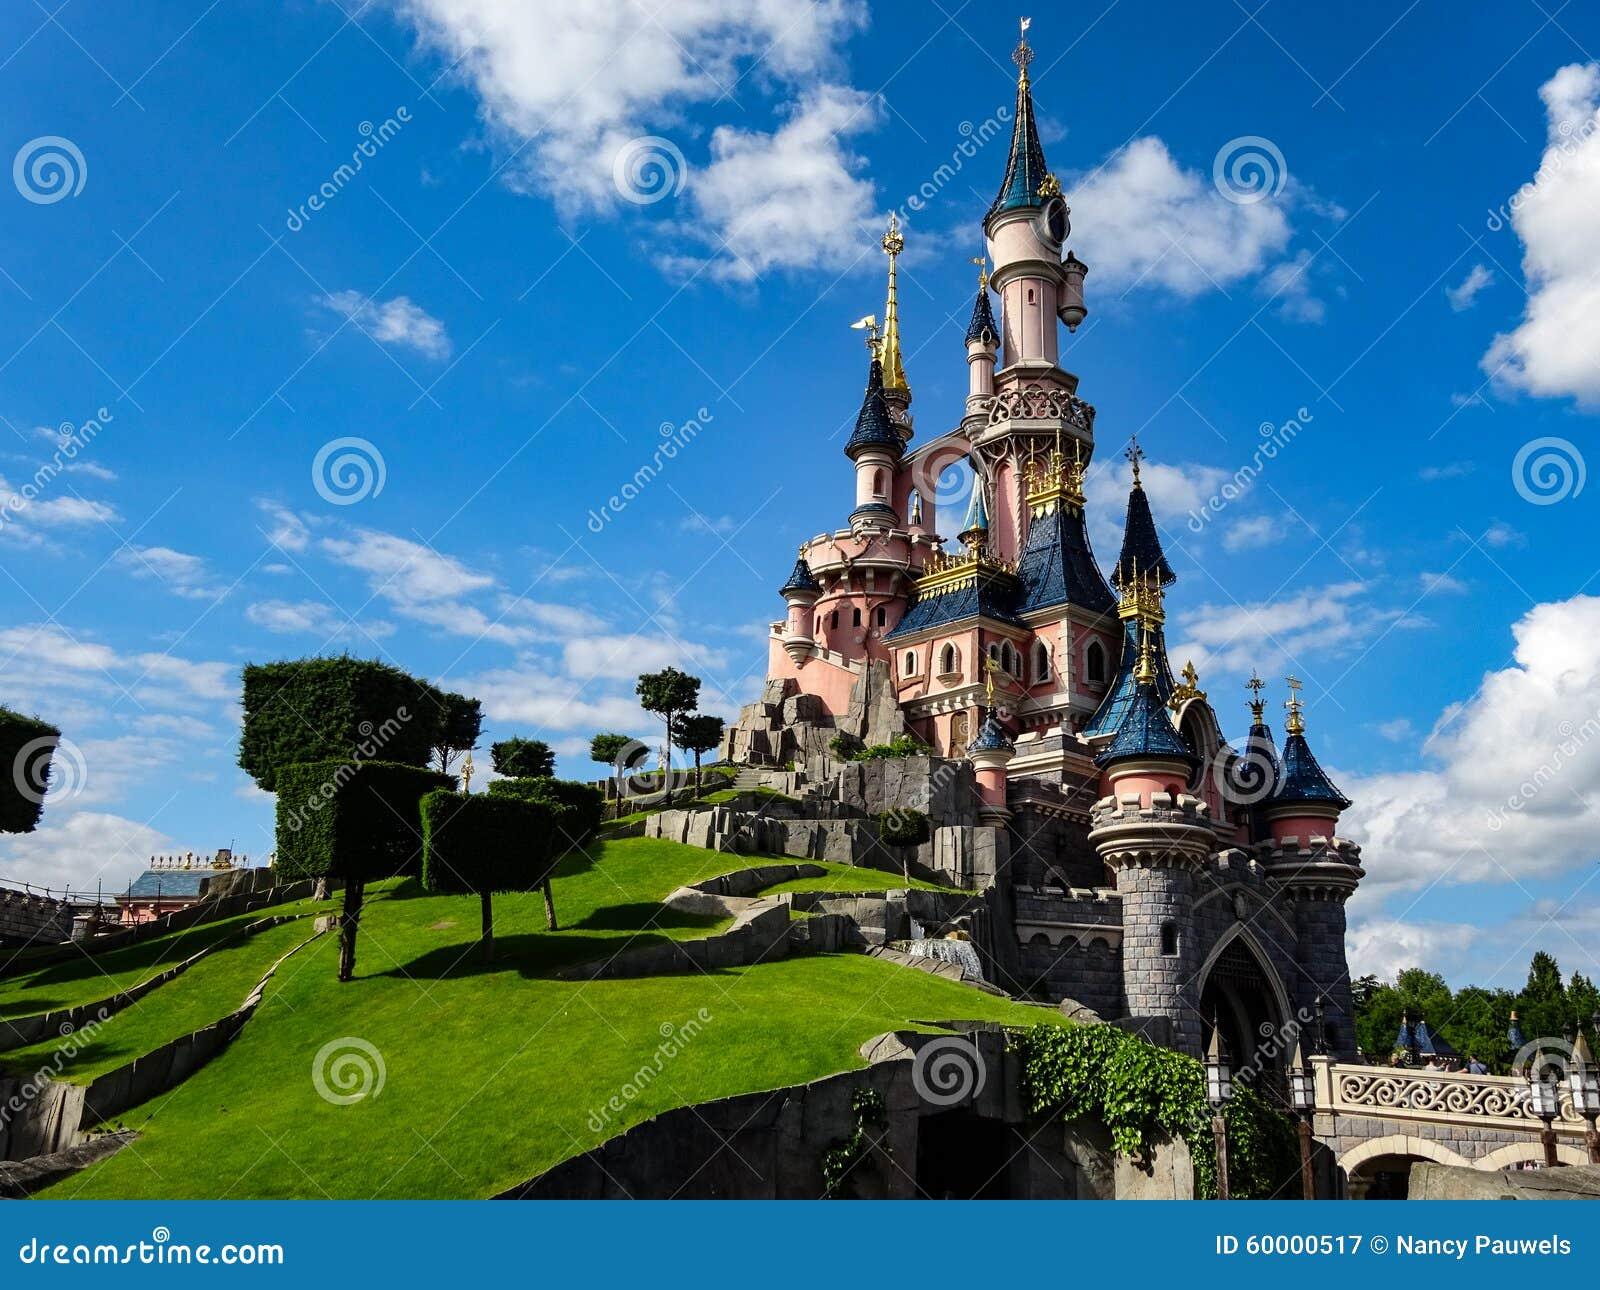 May 24th 2015 : Castle in Disneyland Paris